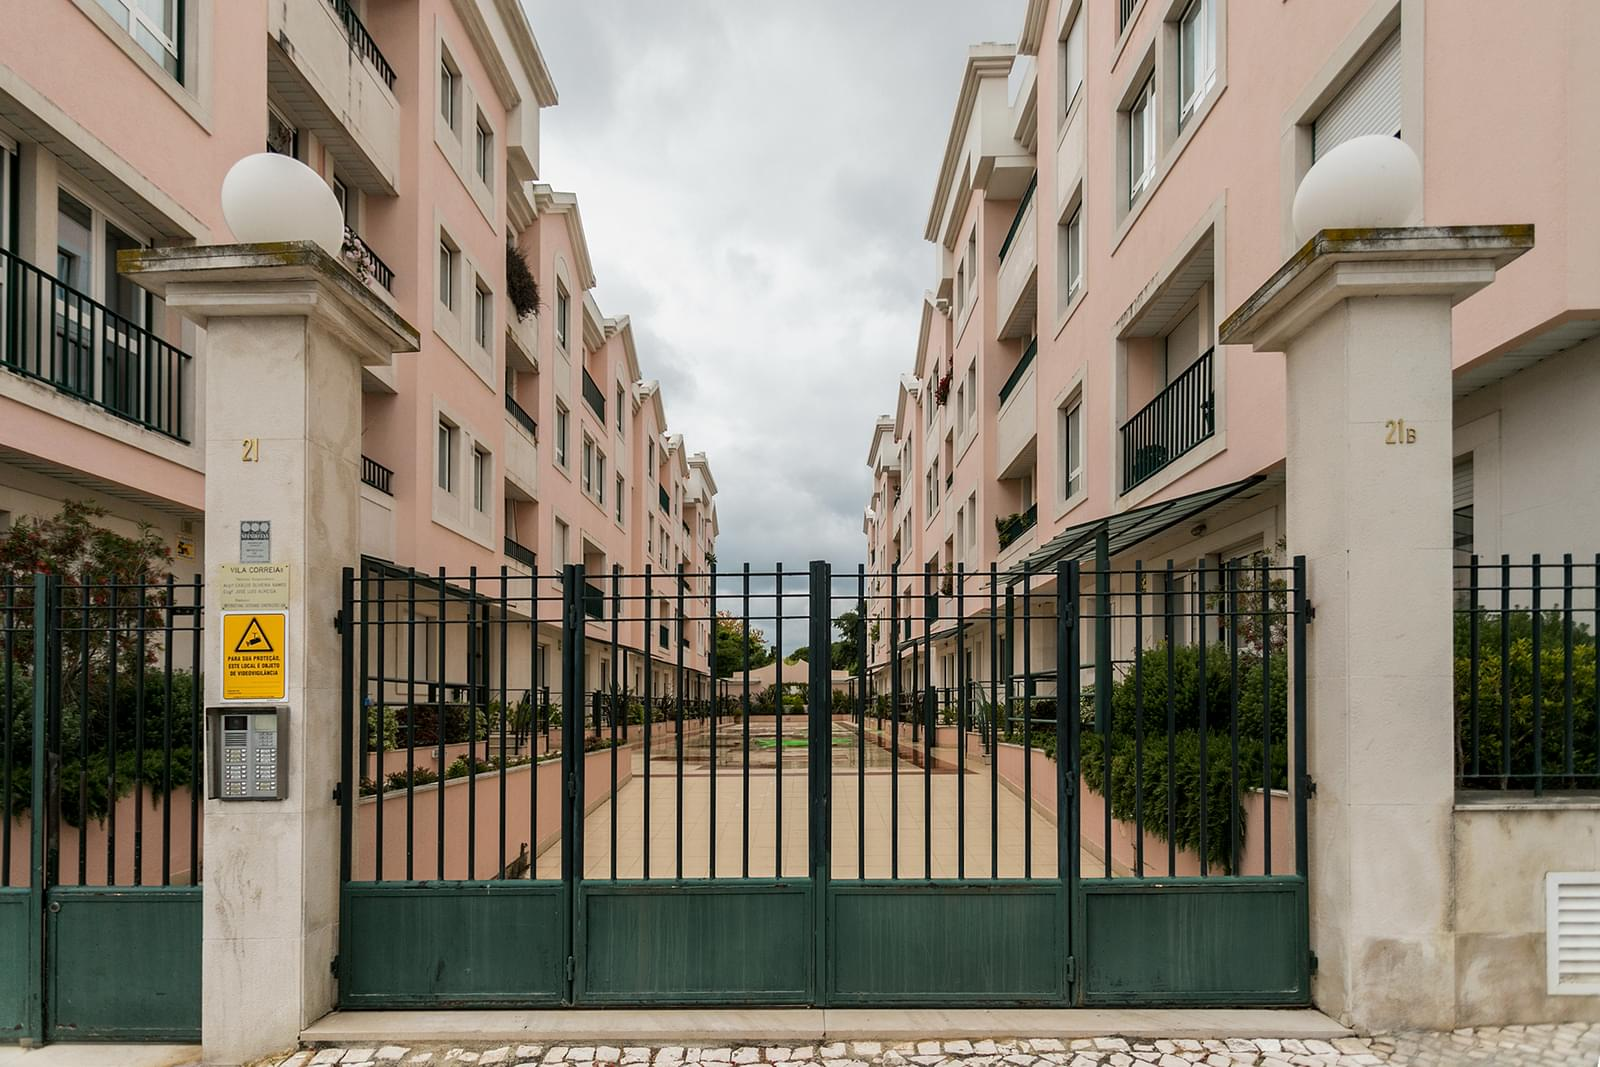 pf17352-apartamento-t3-lisboa-dff32712-016c-4e8f-a9bb-06c09838effe